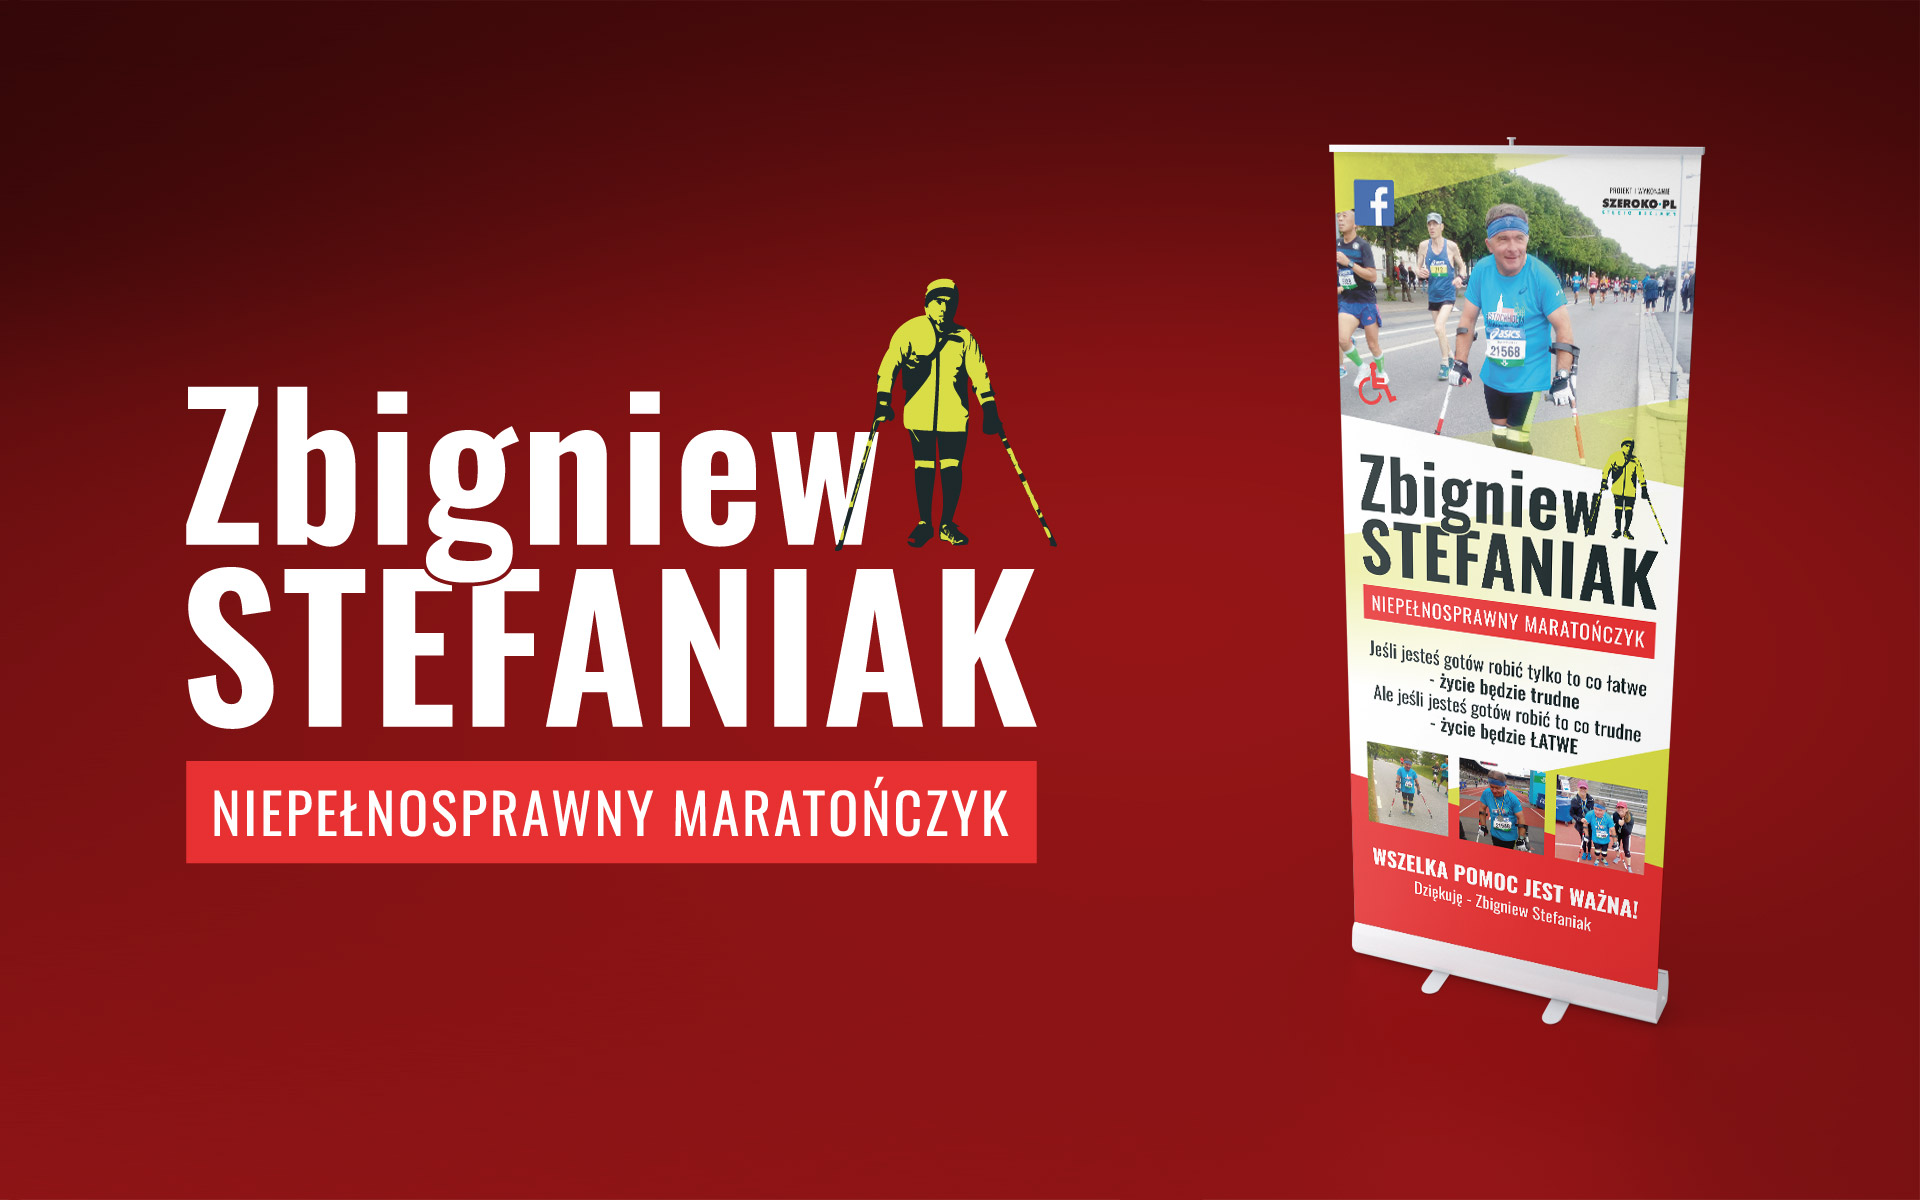 zbigniew-stefaniak-logo-rollup